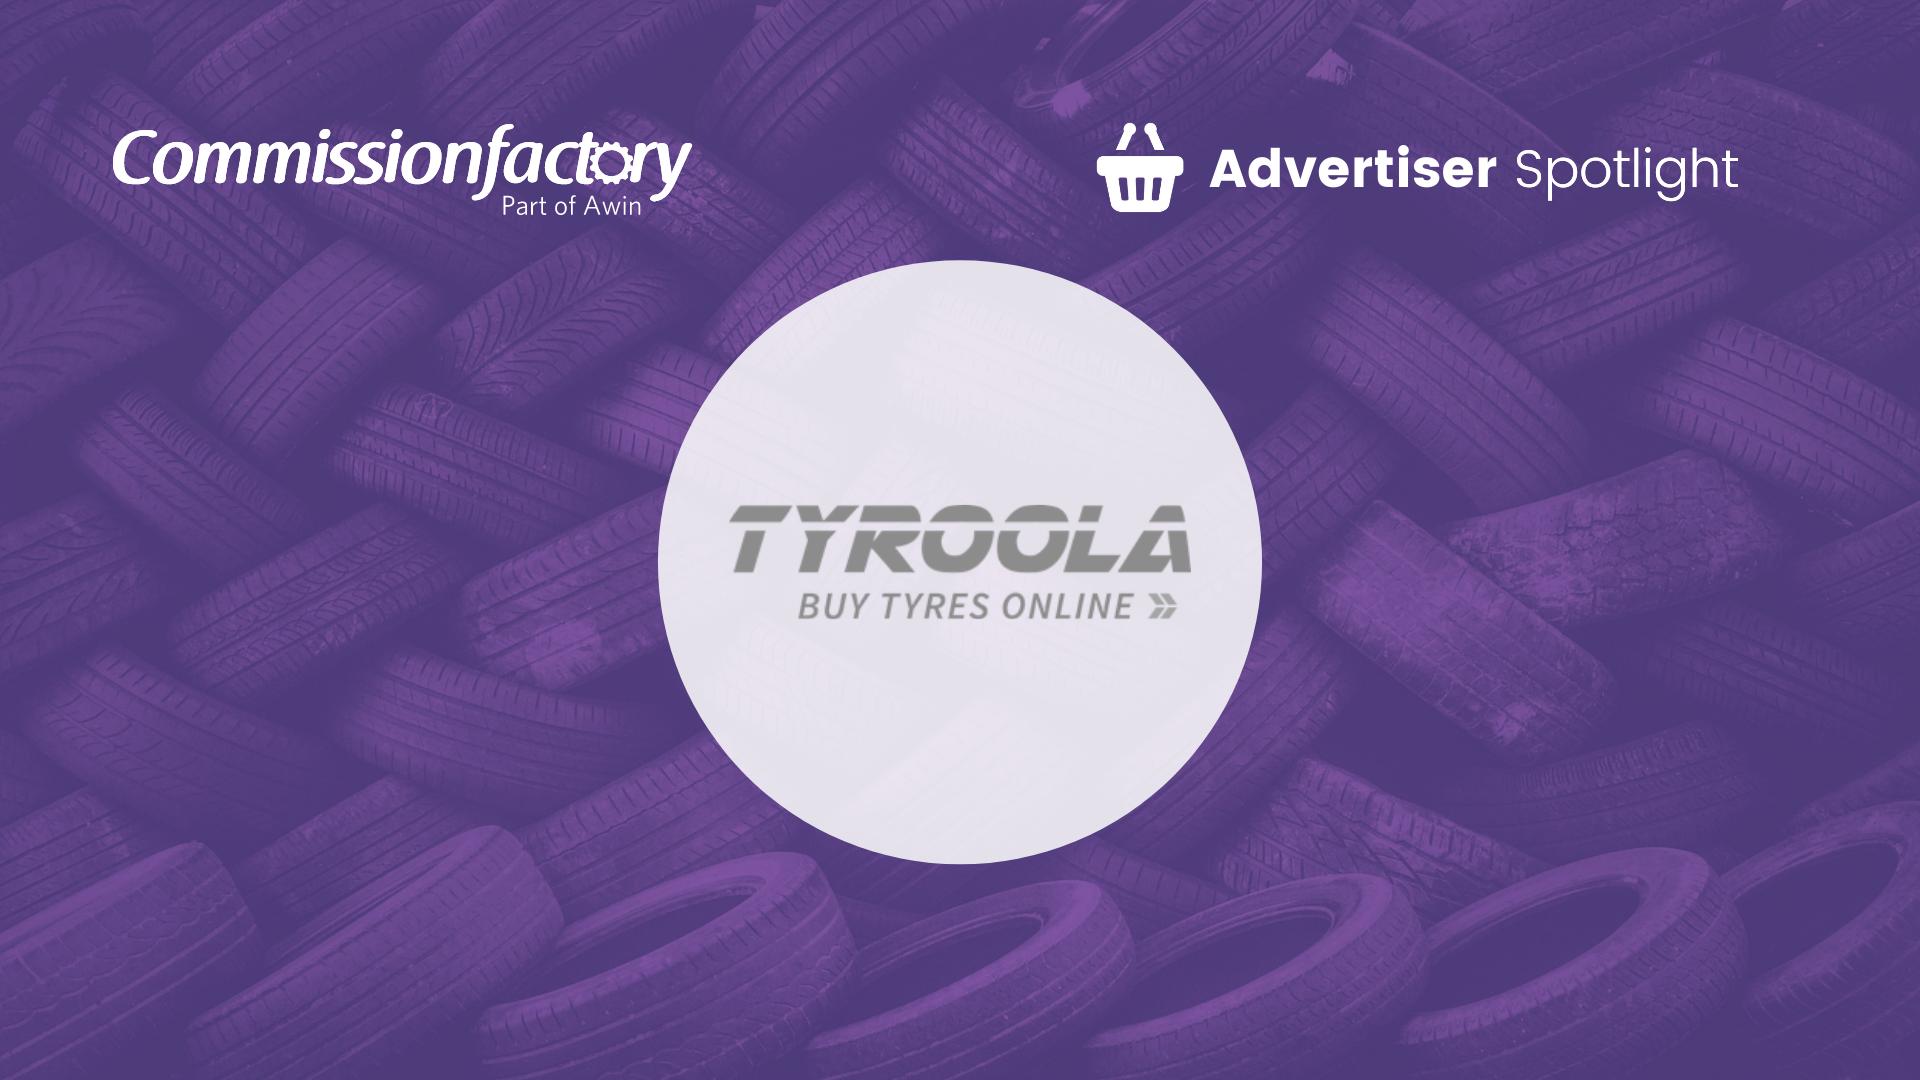 Tyroola Advertiser Spotlight